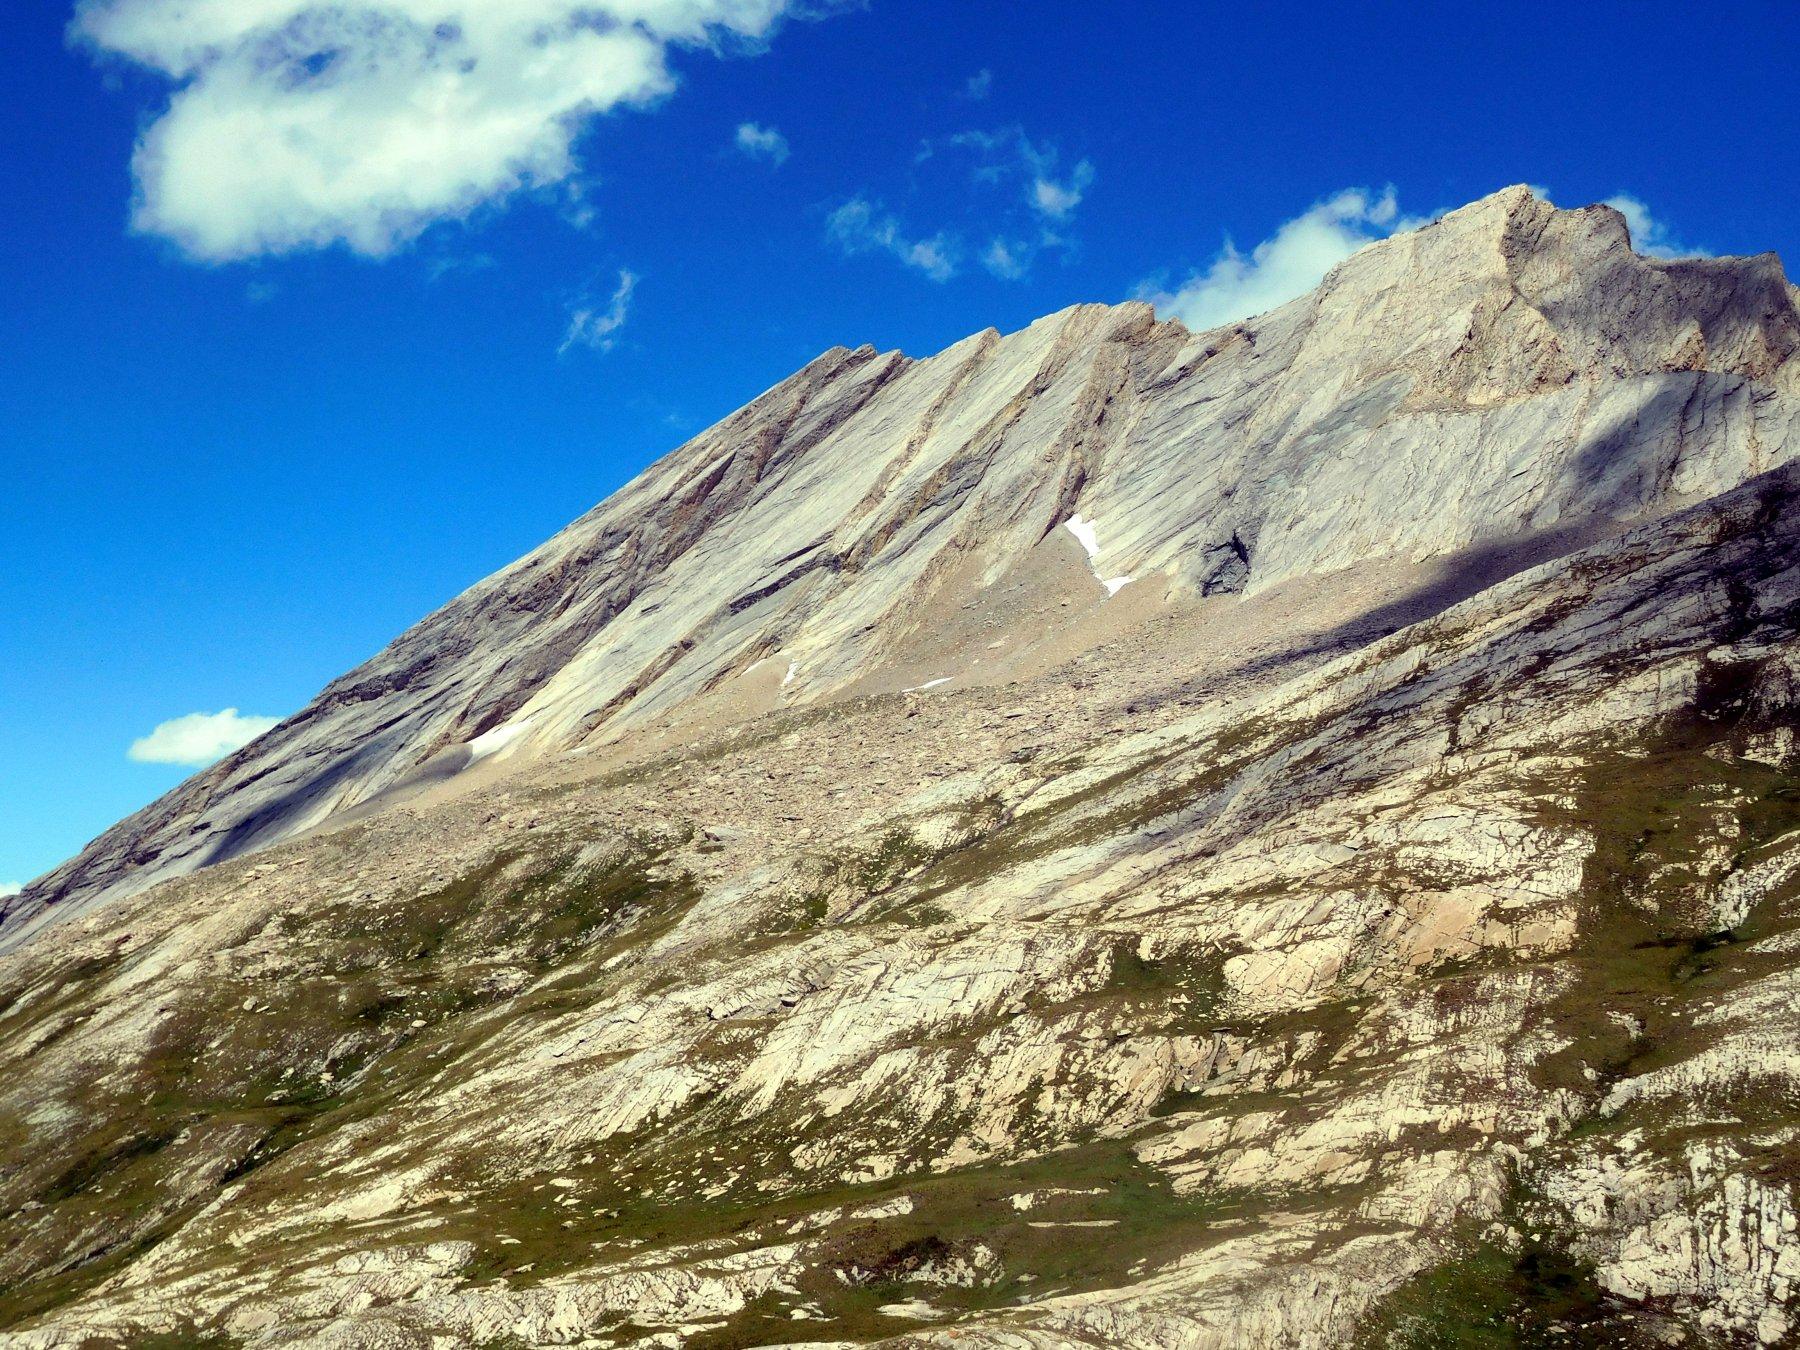 un ultimo sguardo a questa particolare montagna